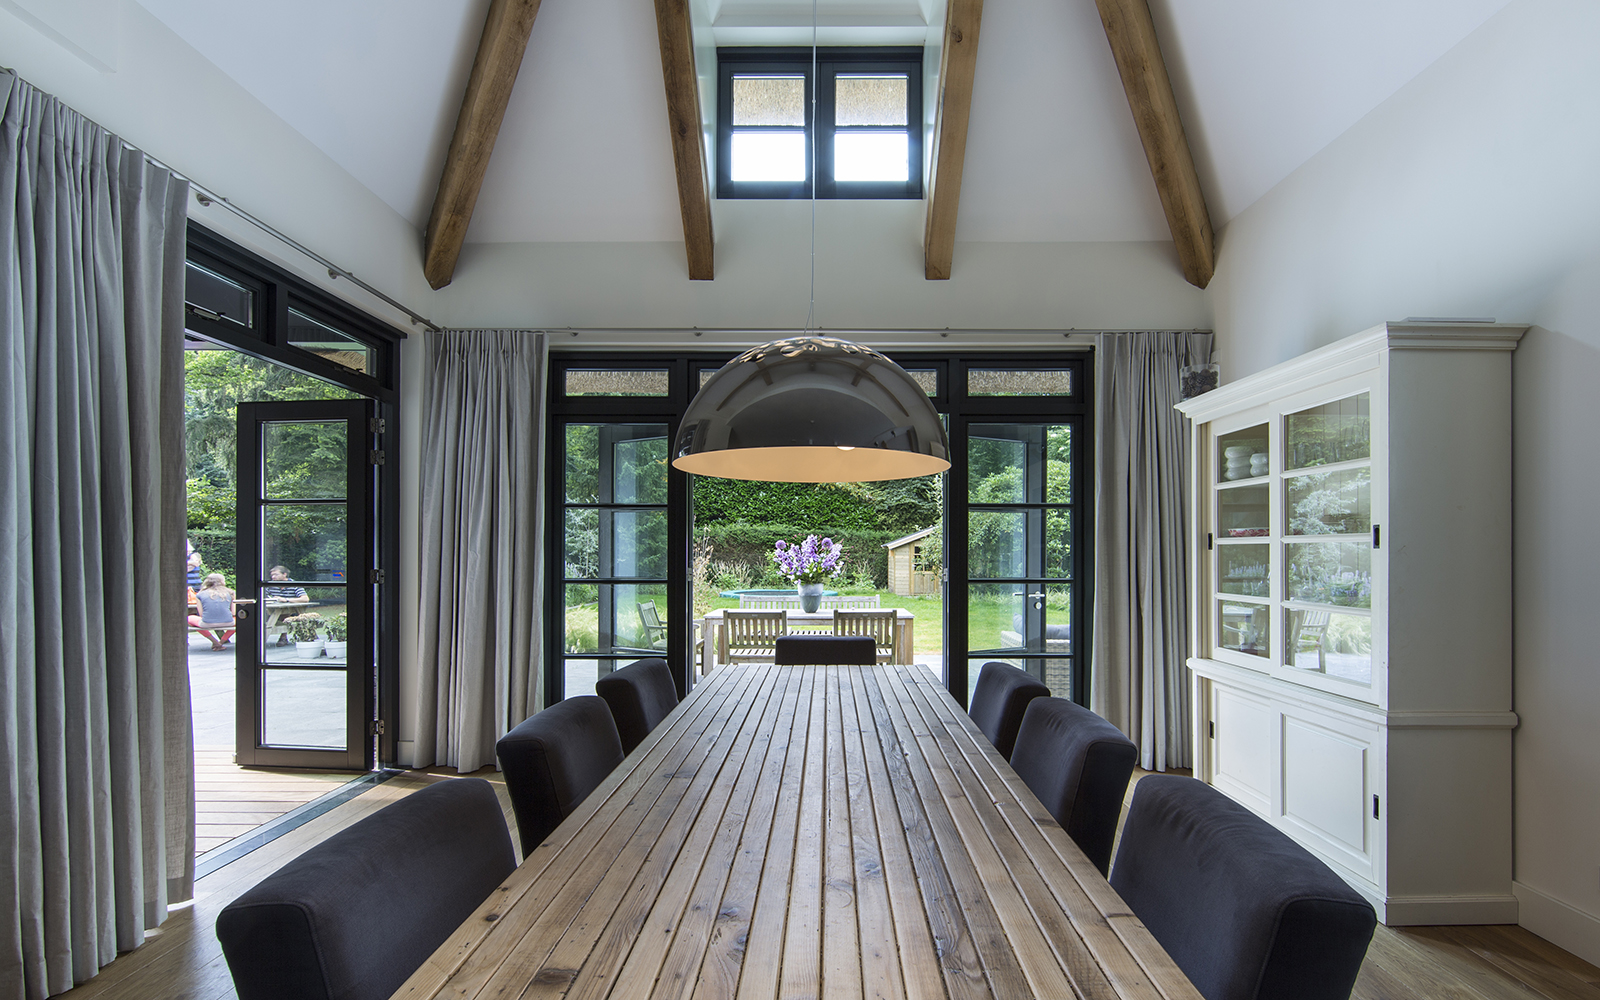 Landelijke villa denoldervleugels the art of living nl